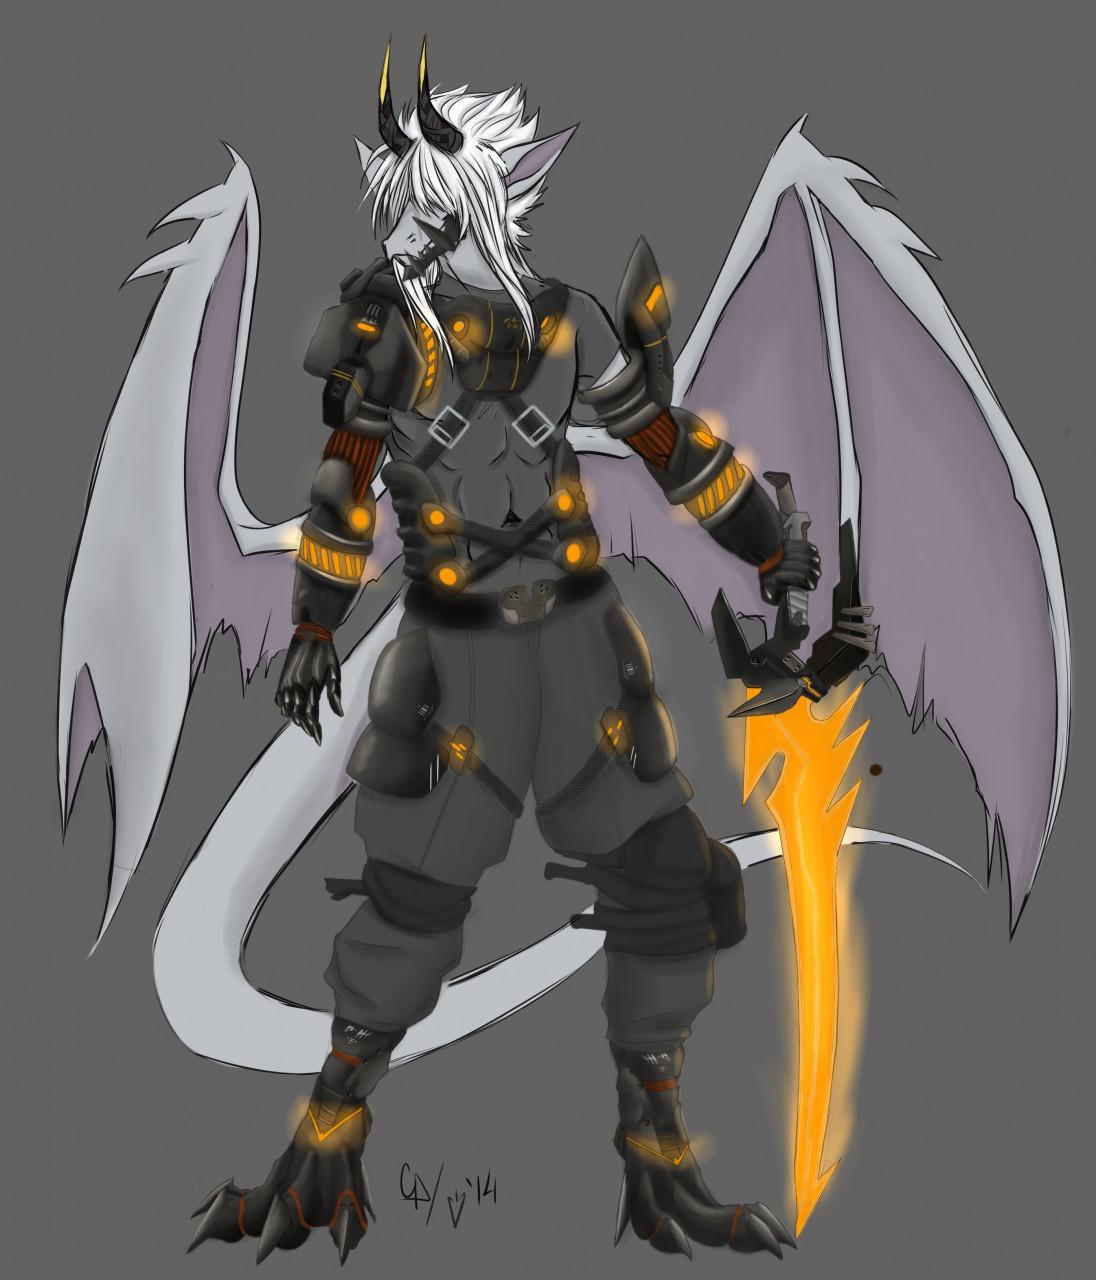 armored dragon lvl 3